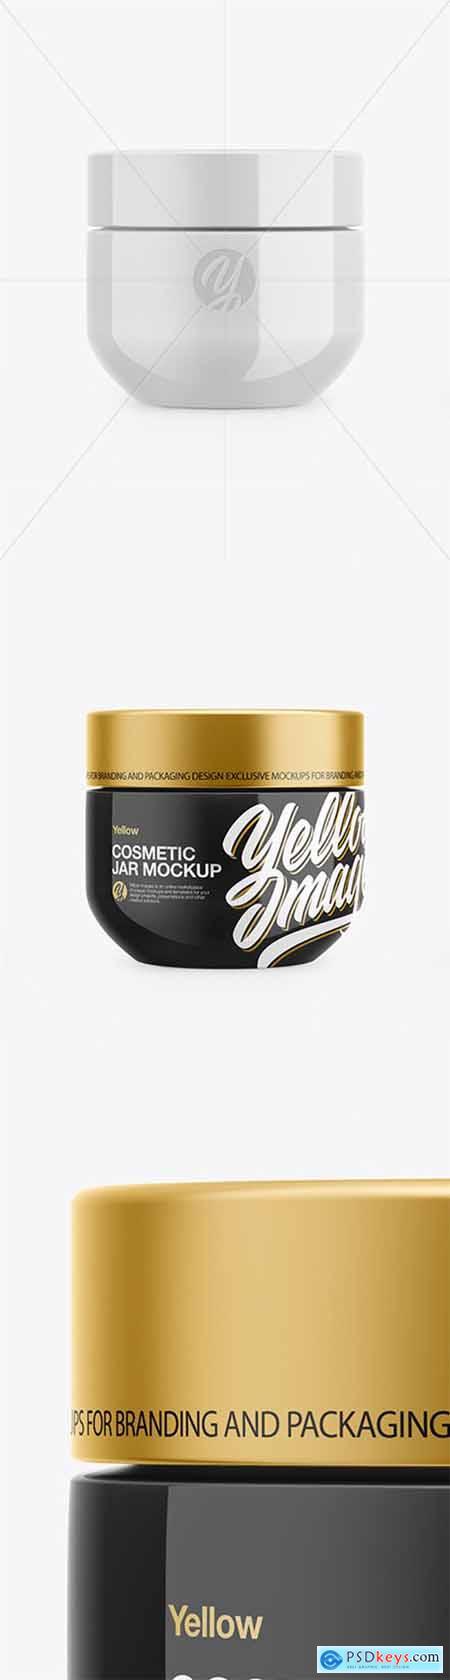 Glossy Cosmetic Jar Mockup 51919